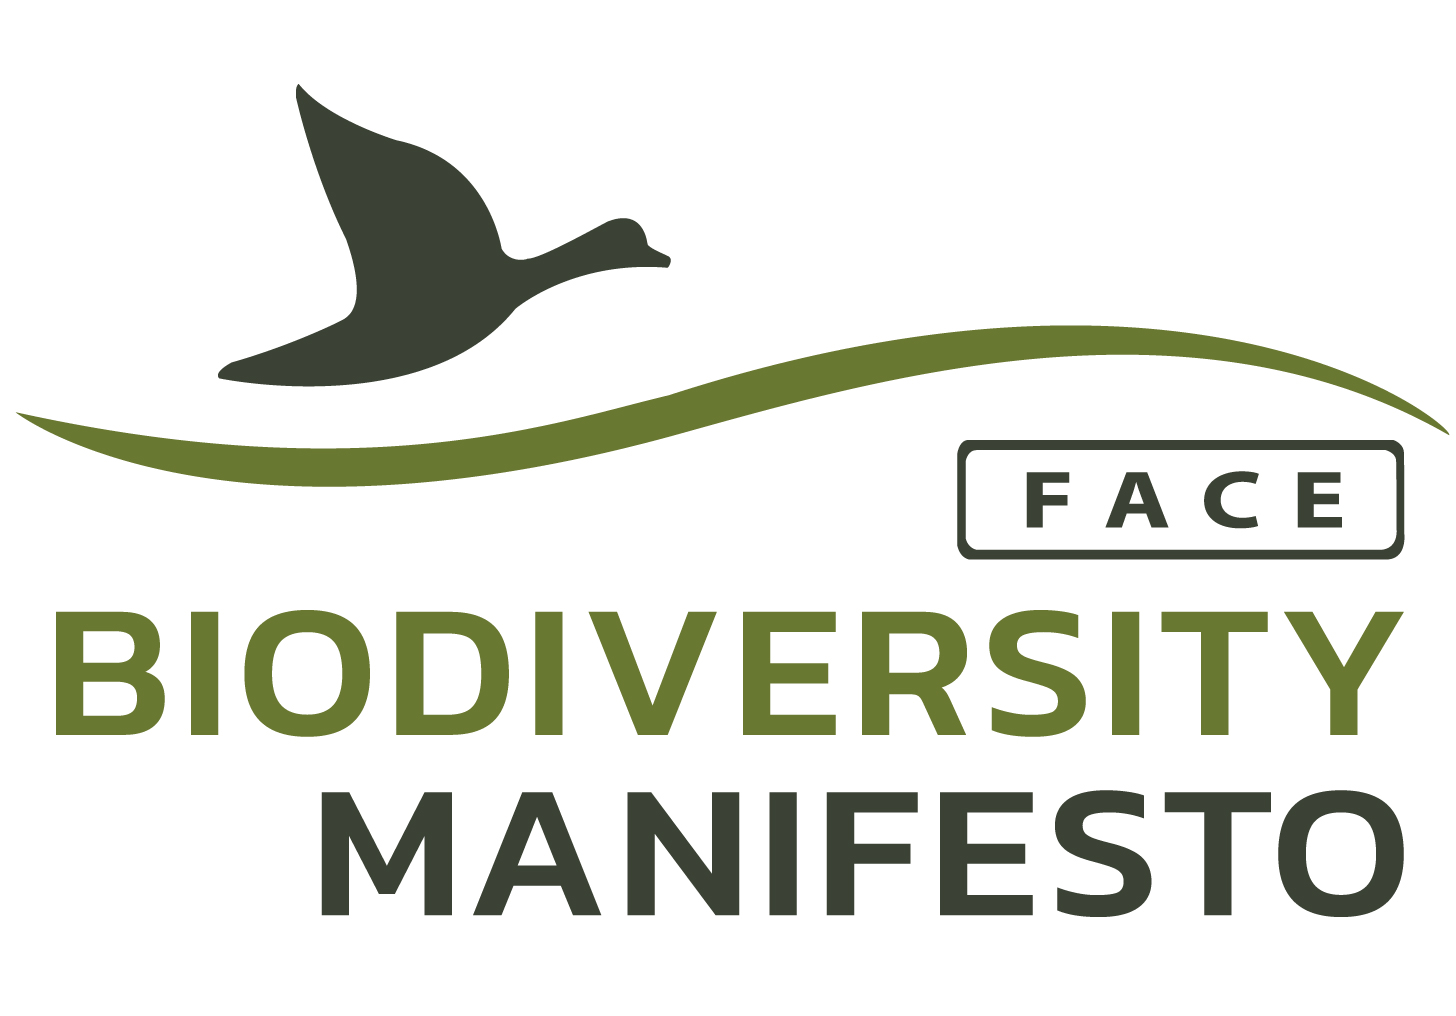 FACE Biodiversity Manifesto